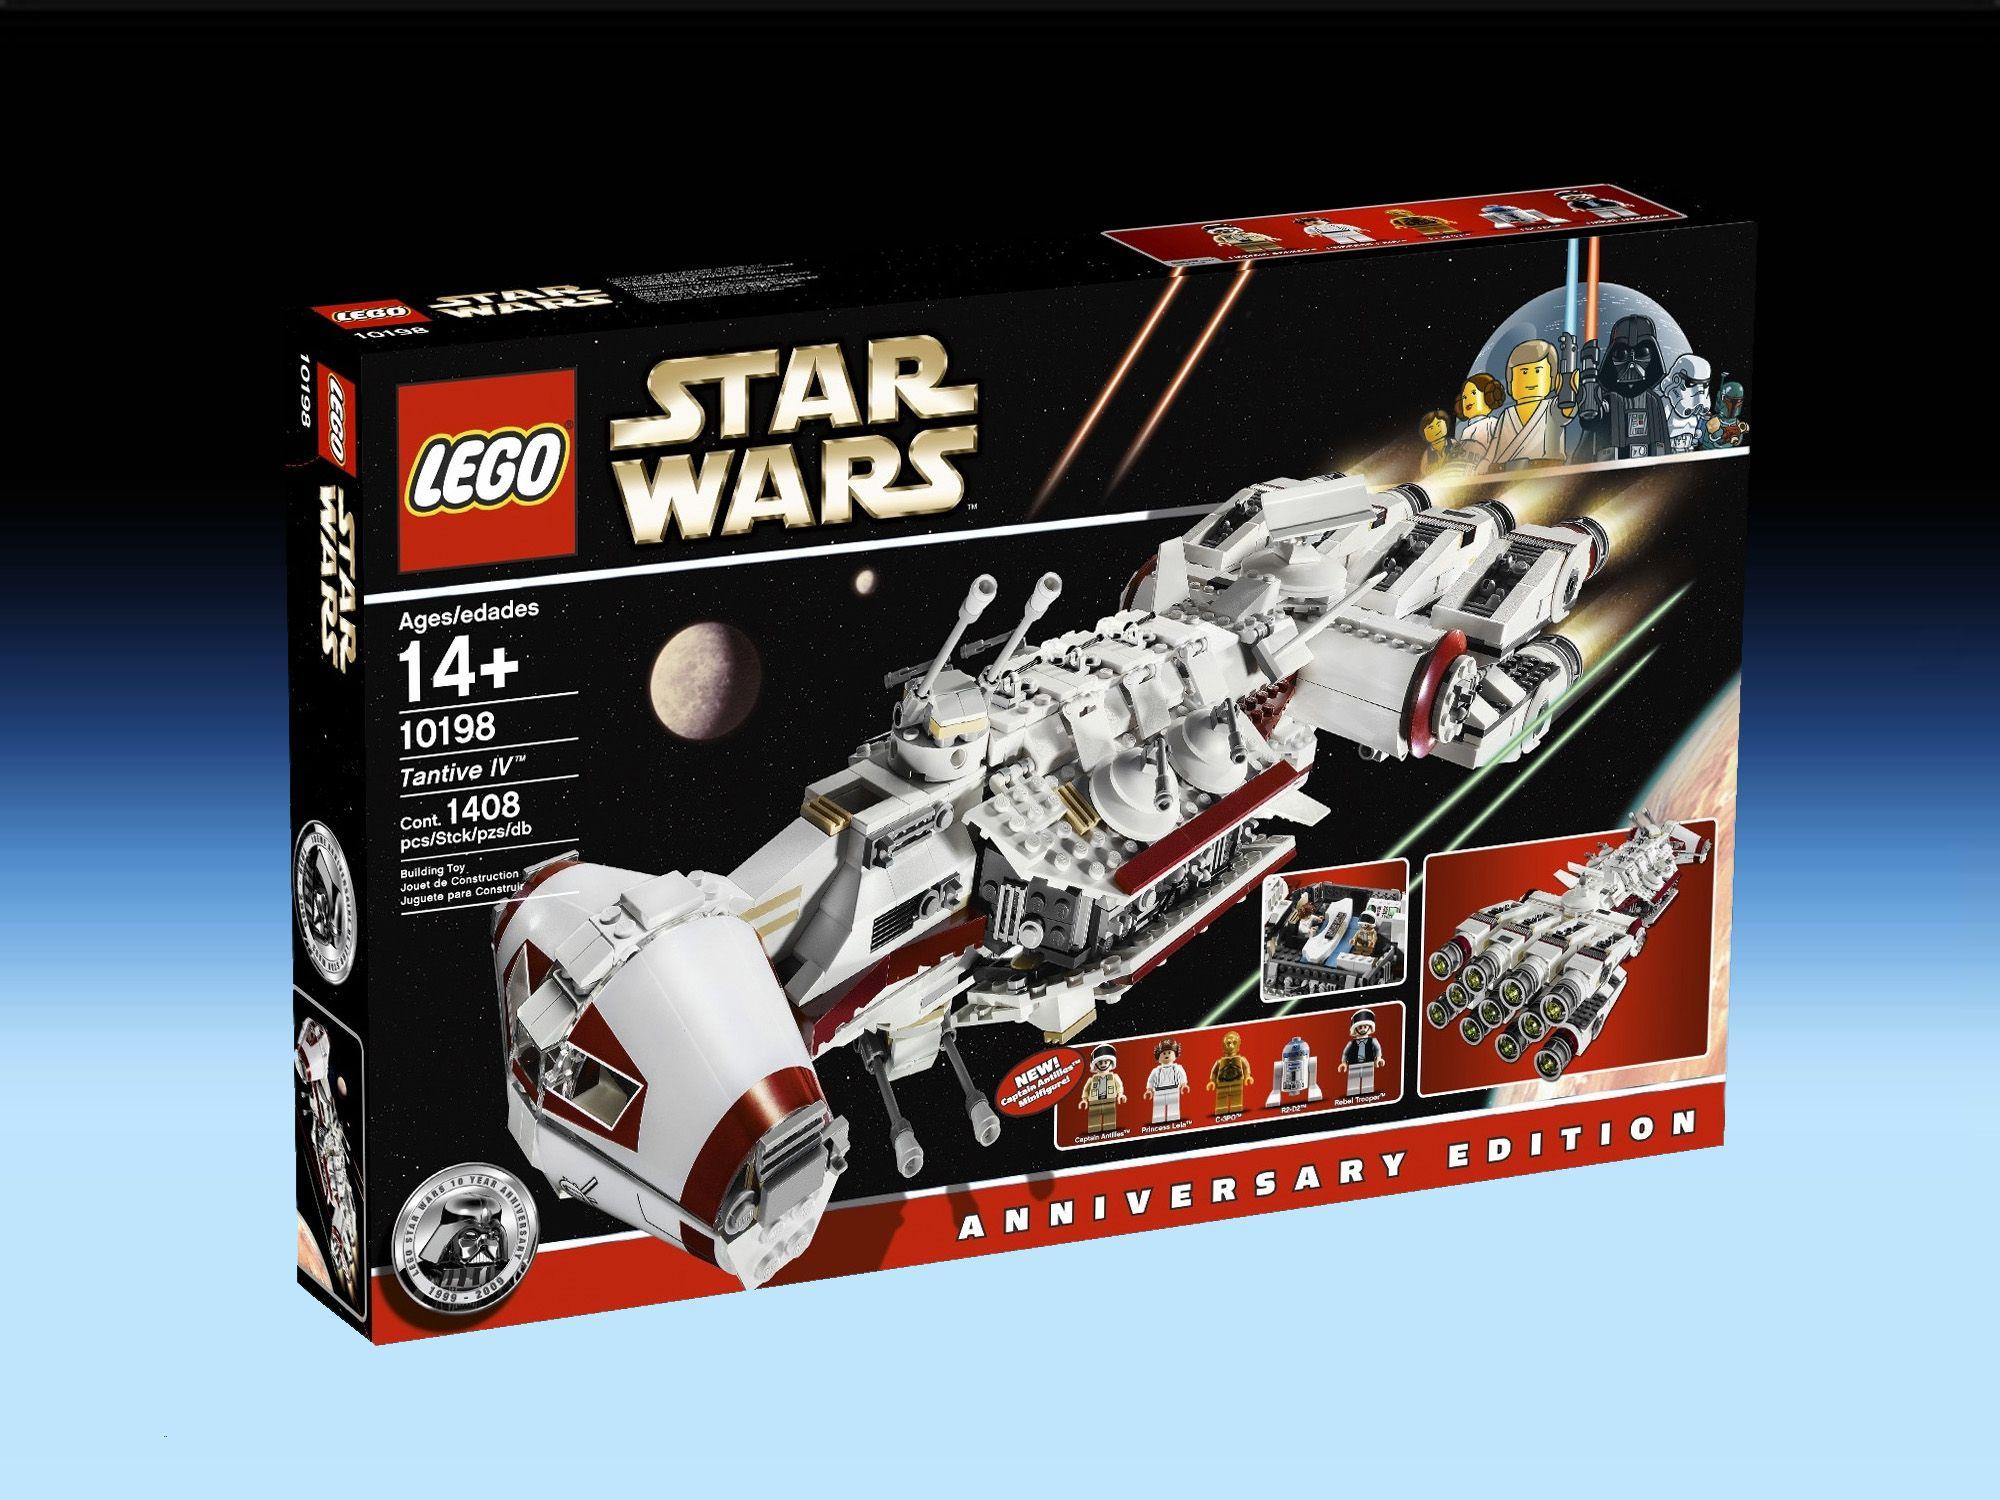 10198 Tantive Iv 2009 1 408 Pieces 5 Mini Figures Lego Star Wars Lego Star Wars Sets Star Wars Toys